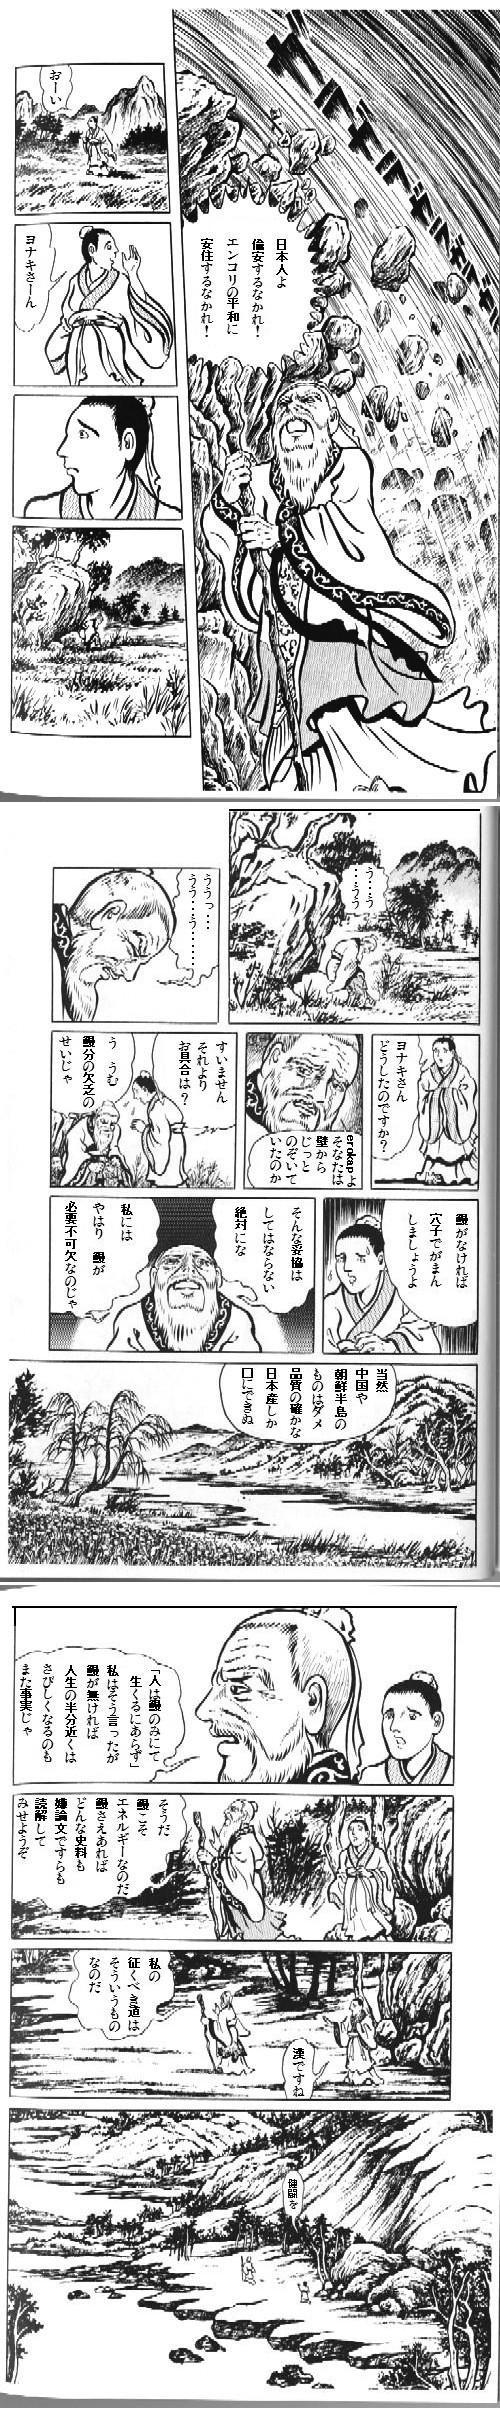 yonaki_ankoku3.jpg